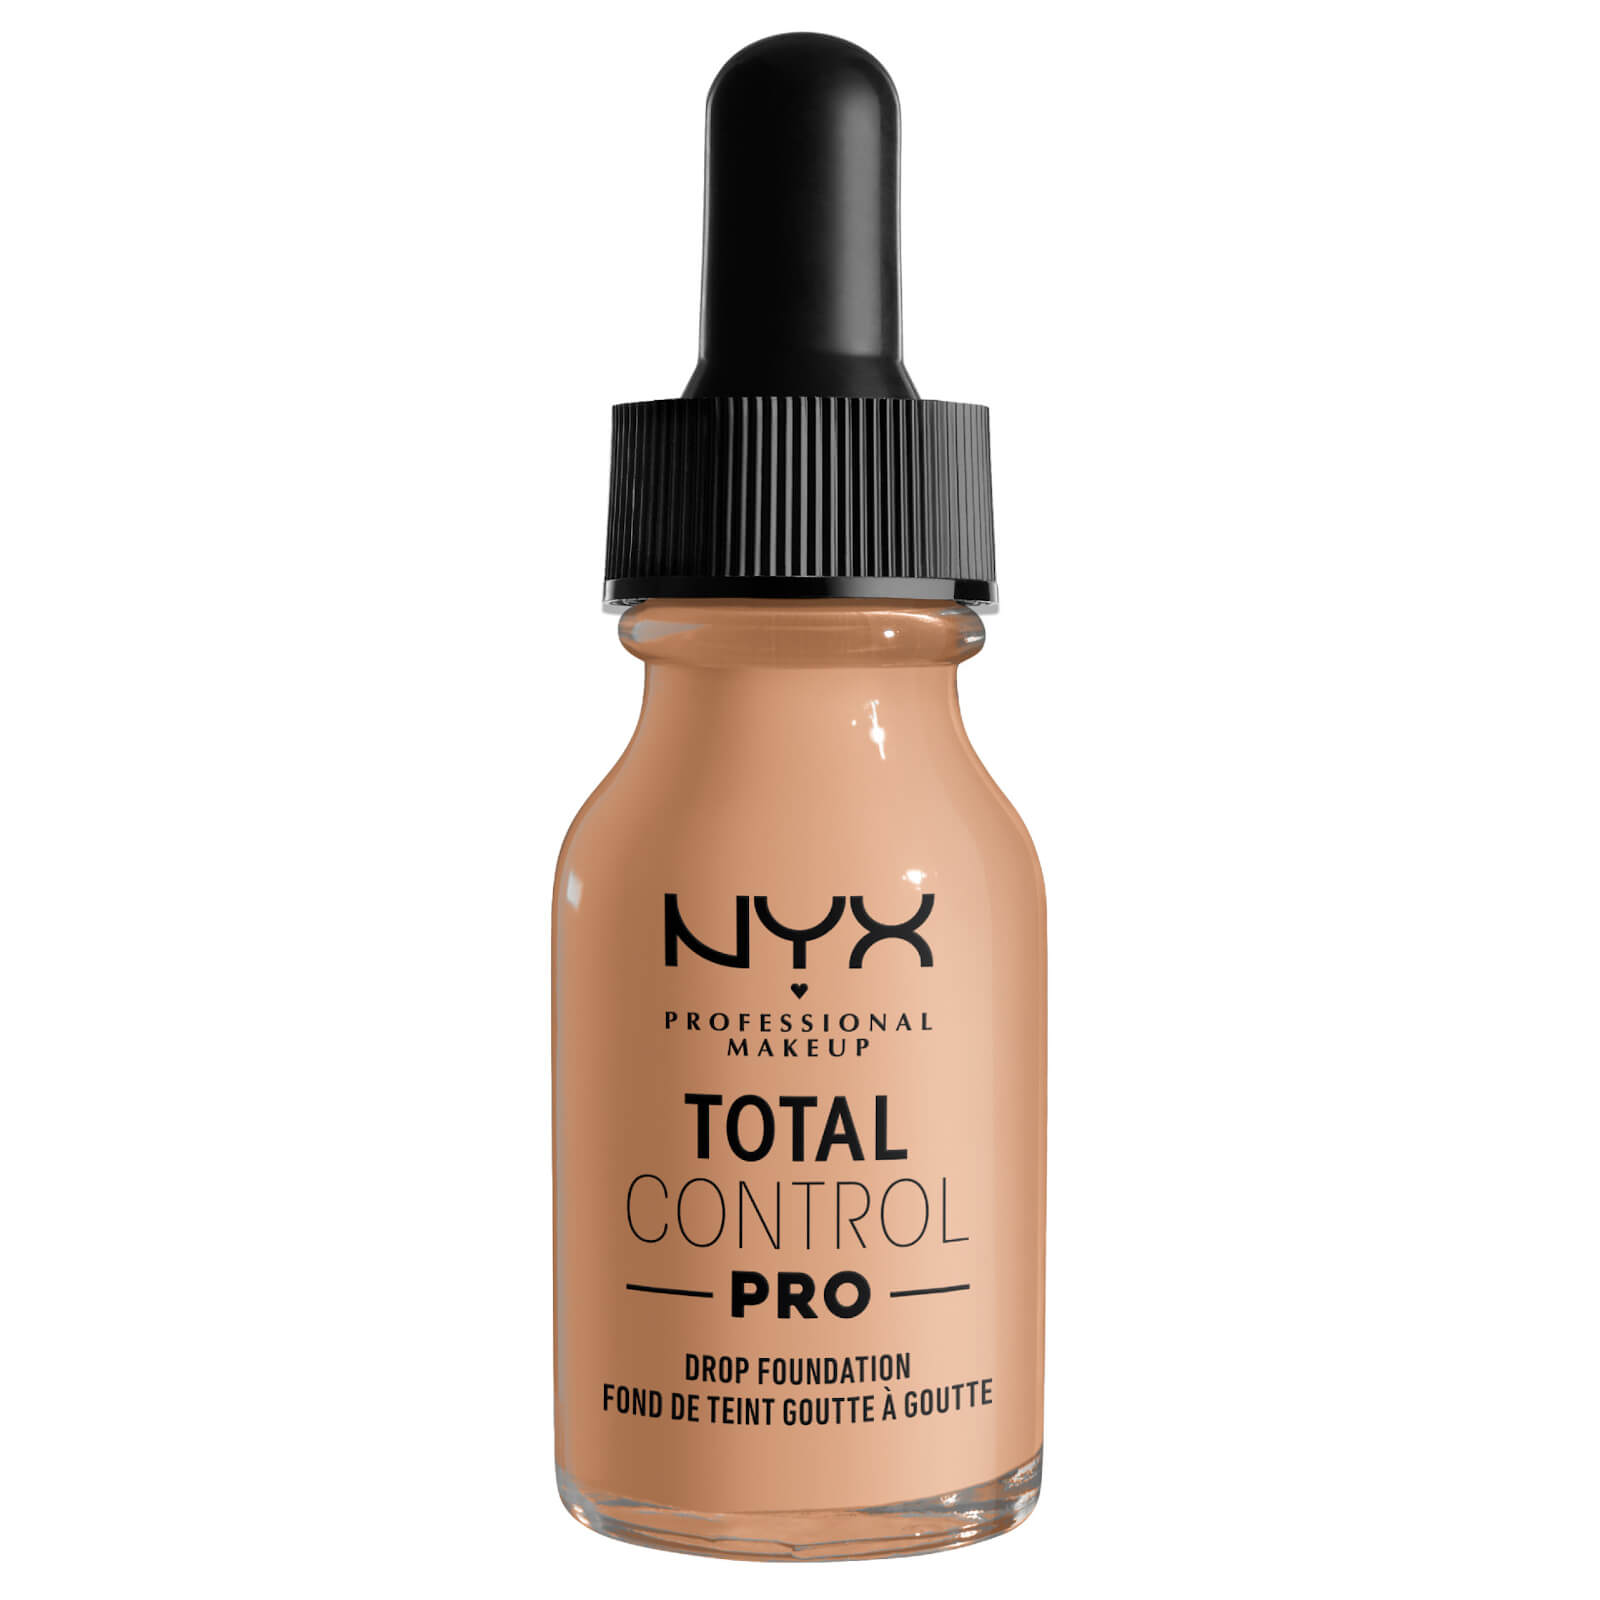 Купить NYX Professional Makeup Total Control Pro Drop Controllable Coverage Foundation - Soft Beige 60ml